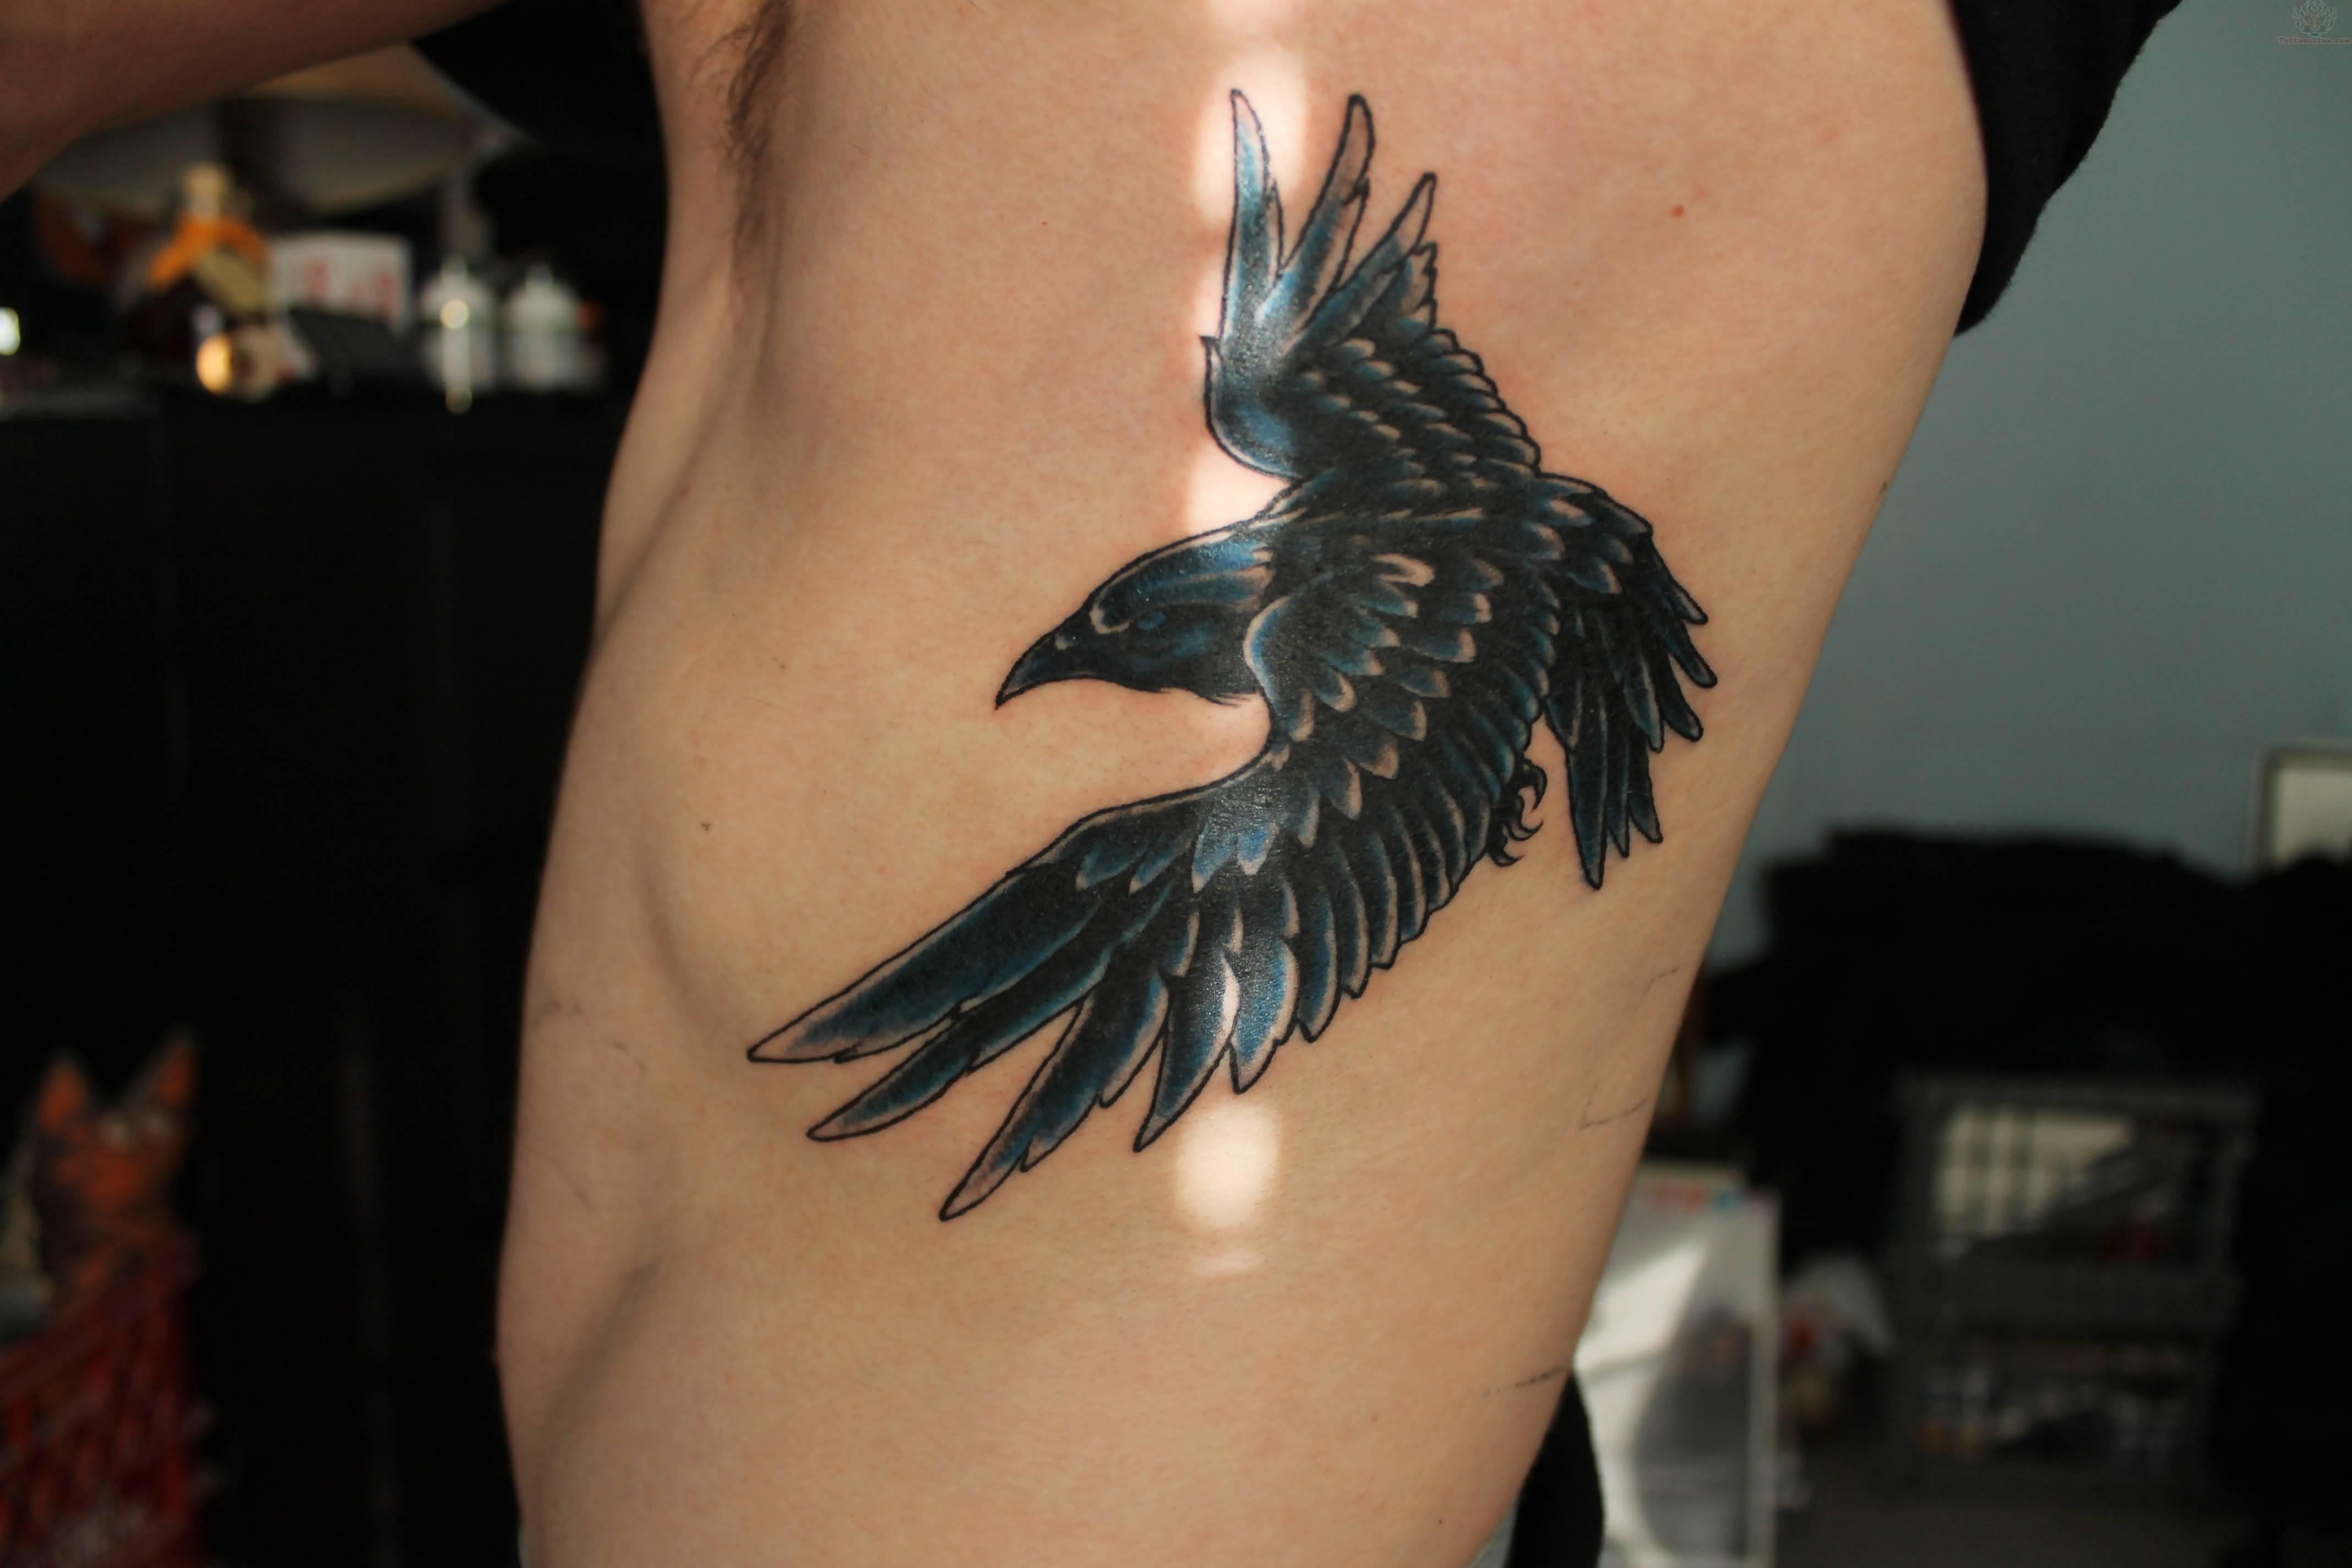 63 latest raven tattoos ideas blue and black flying raven tattoo on man side rib buycottarizona Gallery